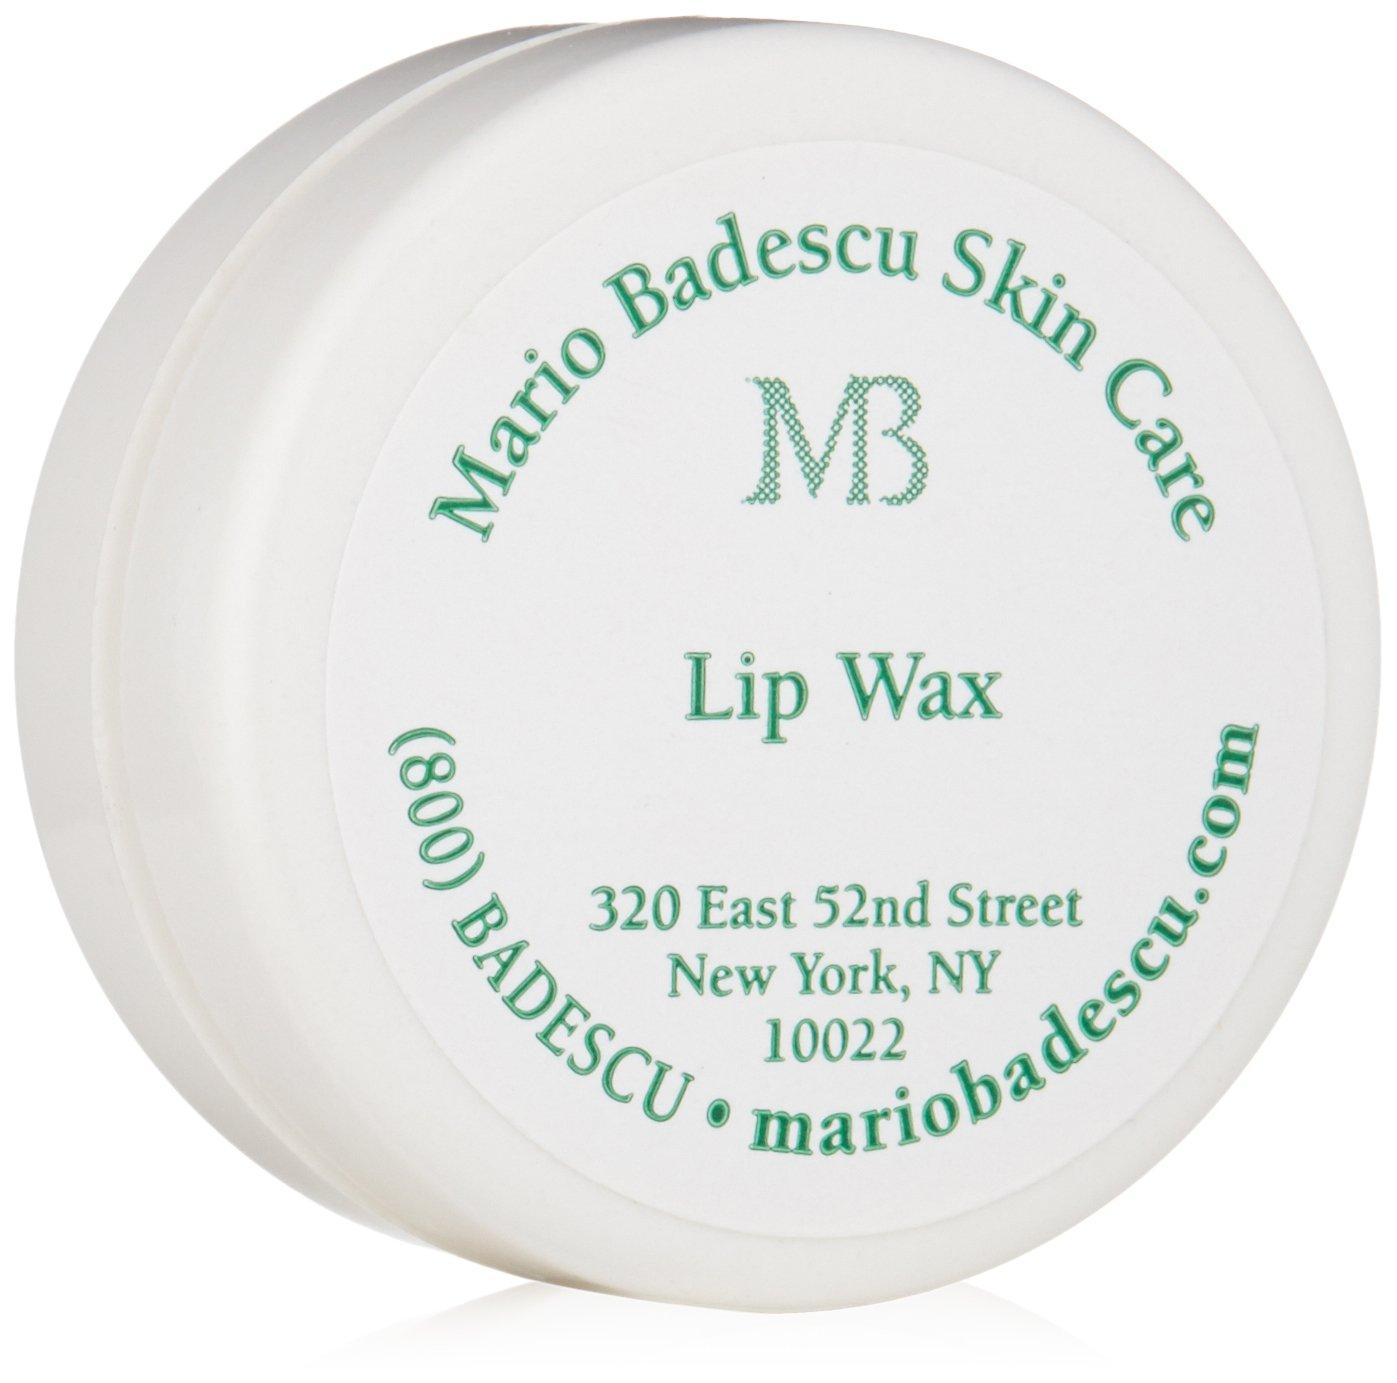 Mario Badescu lip wax (jar) 0.15oz